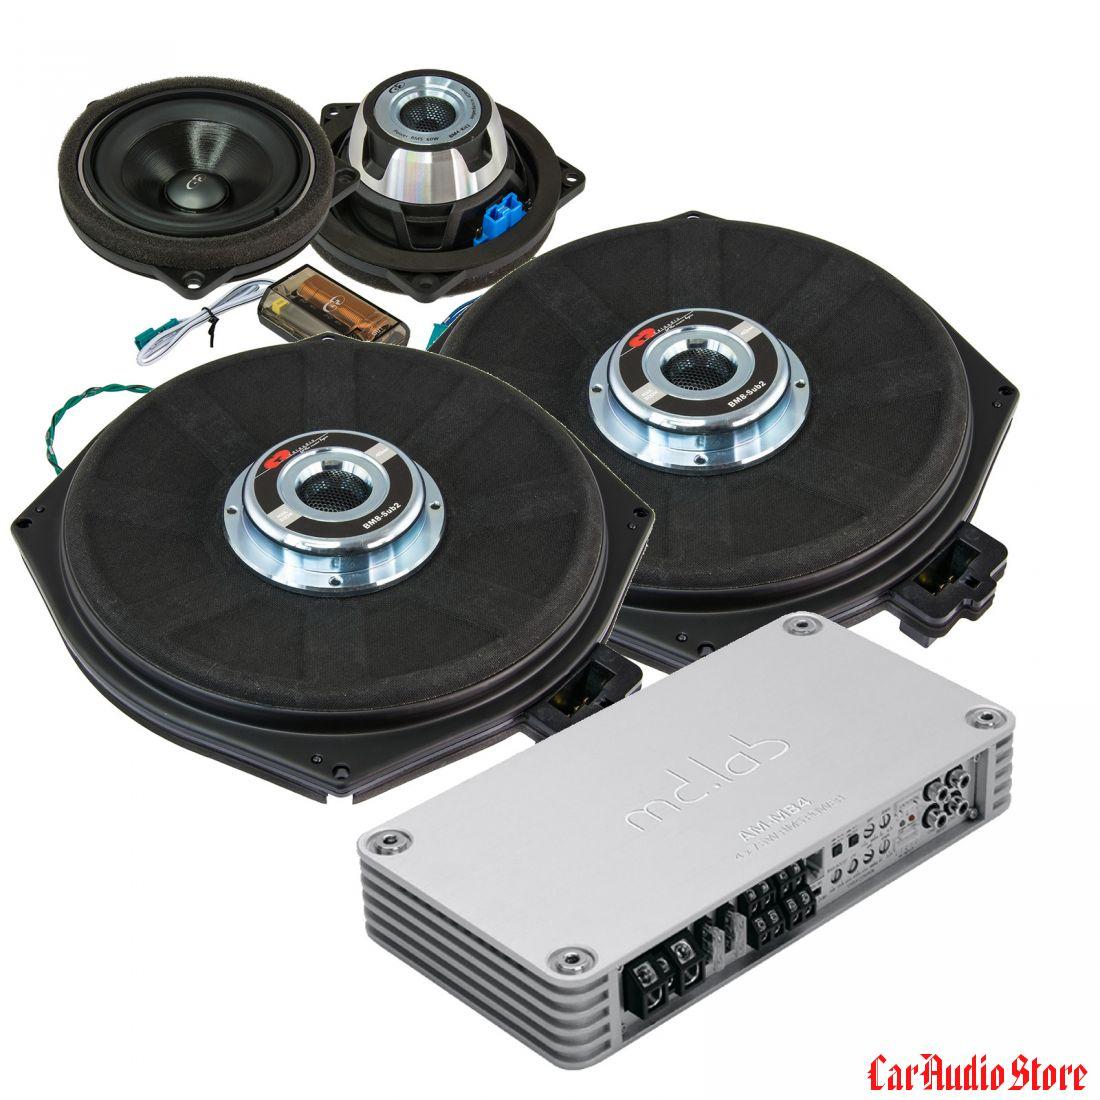 Base Kit Plus CDT Audio 1.2 (MD LAB)